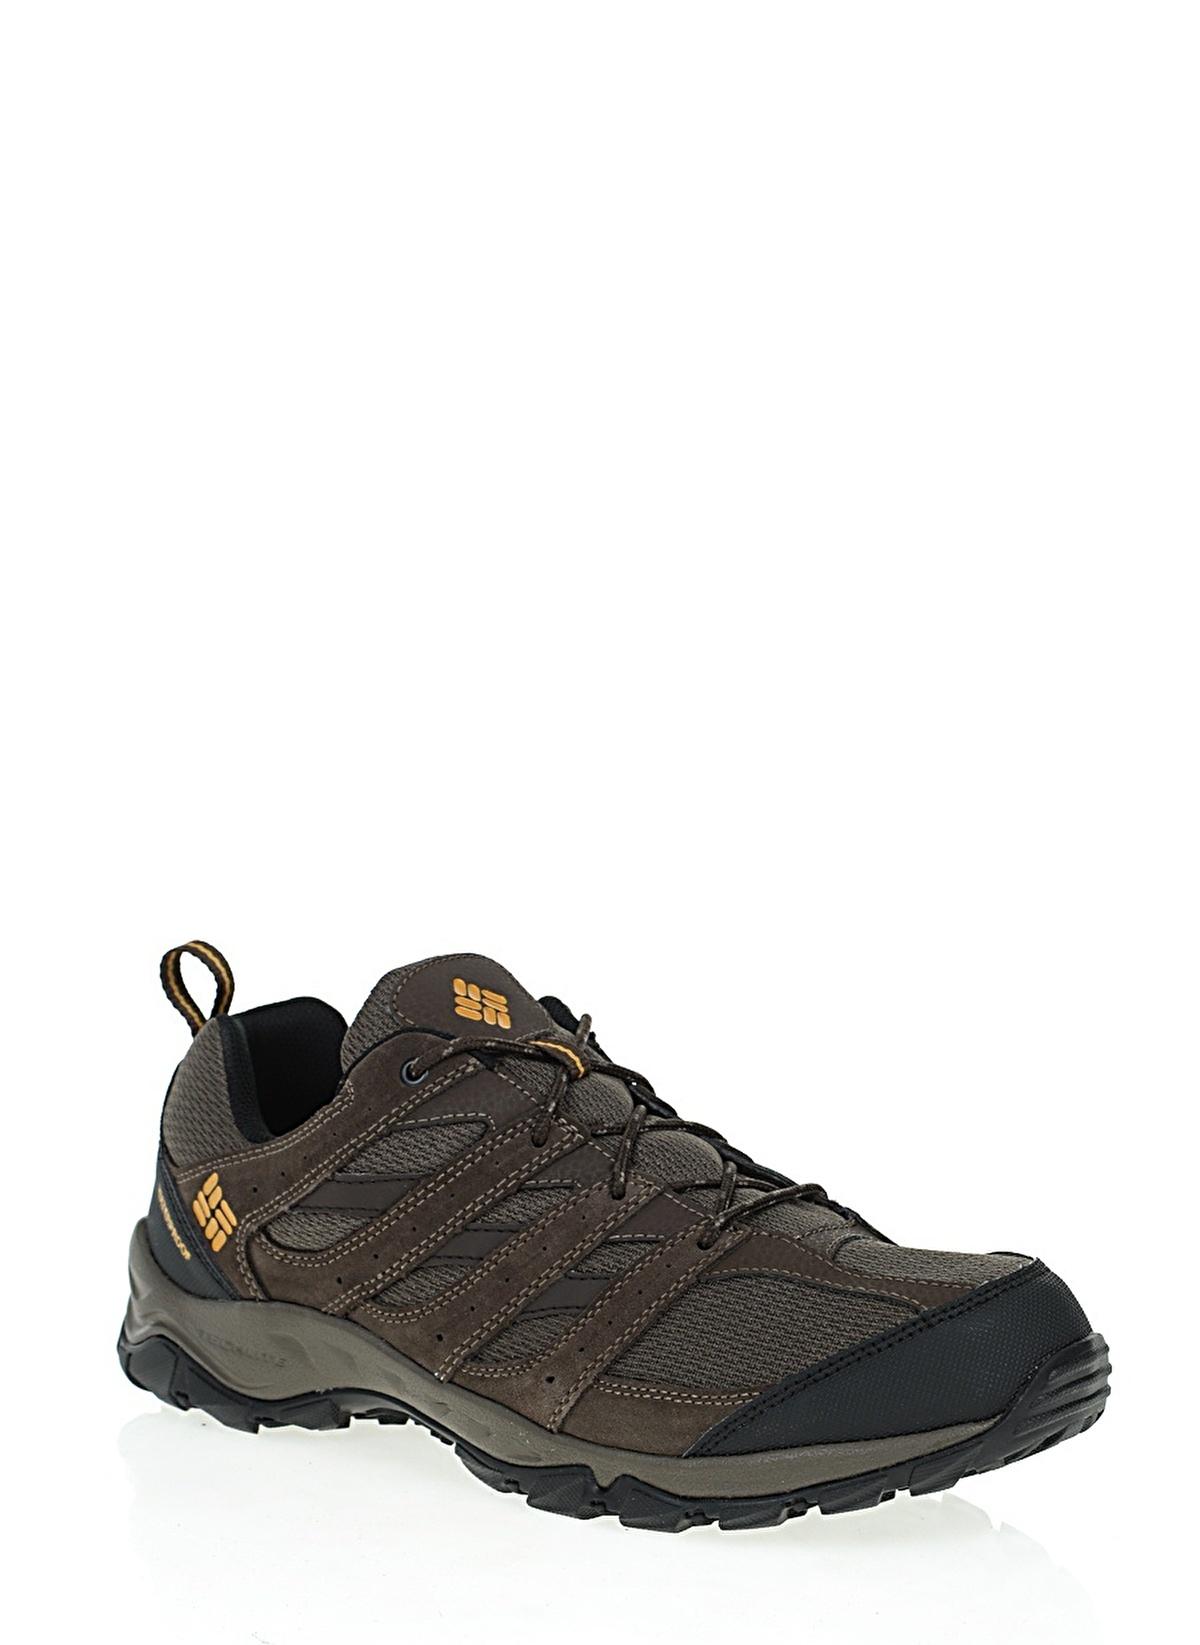 Columbia Erkek Outdoor Ayakkabı Kahverengi | Morhipo | 17955647